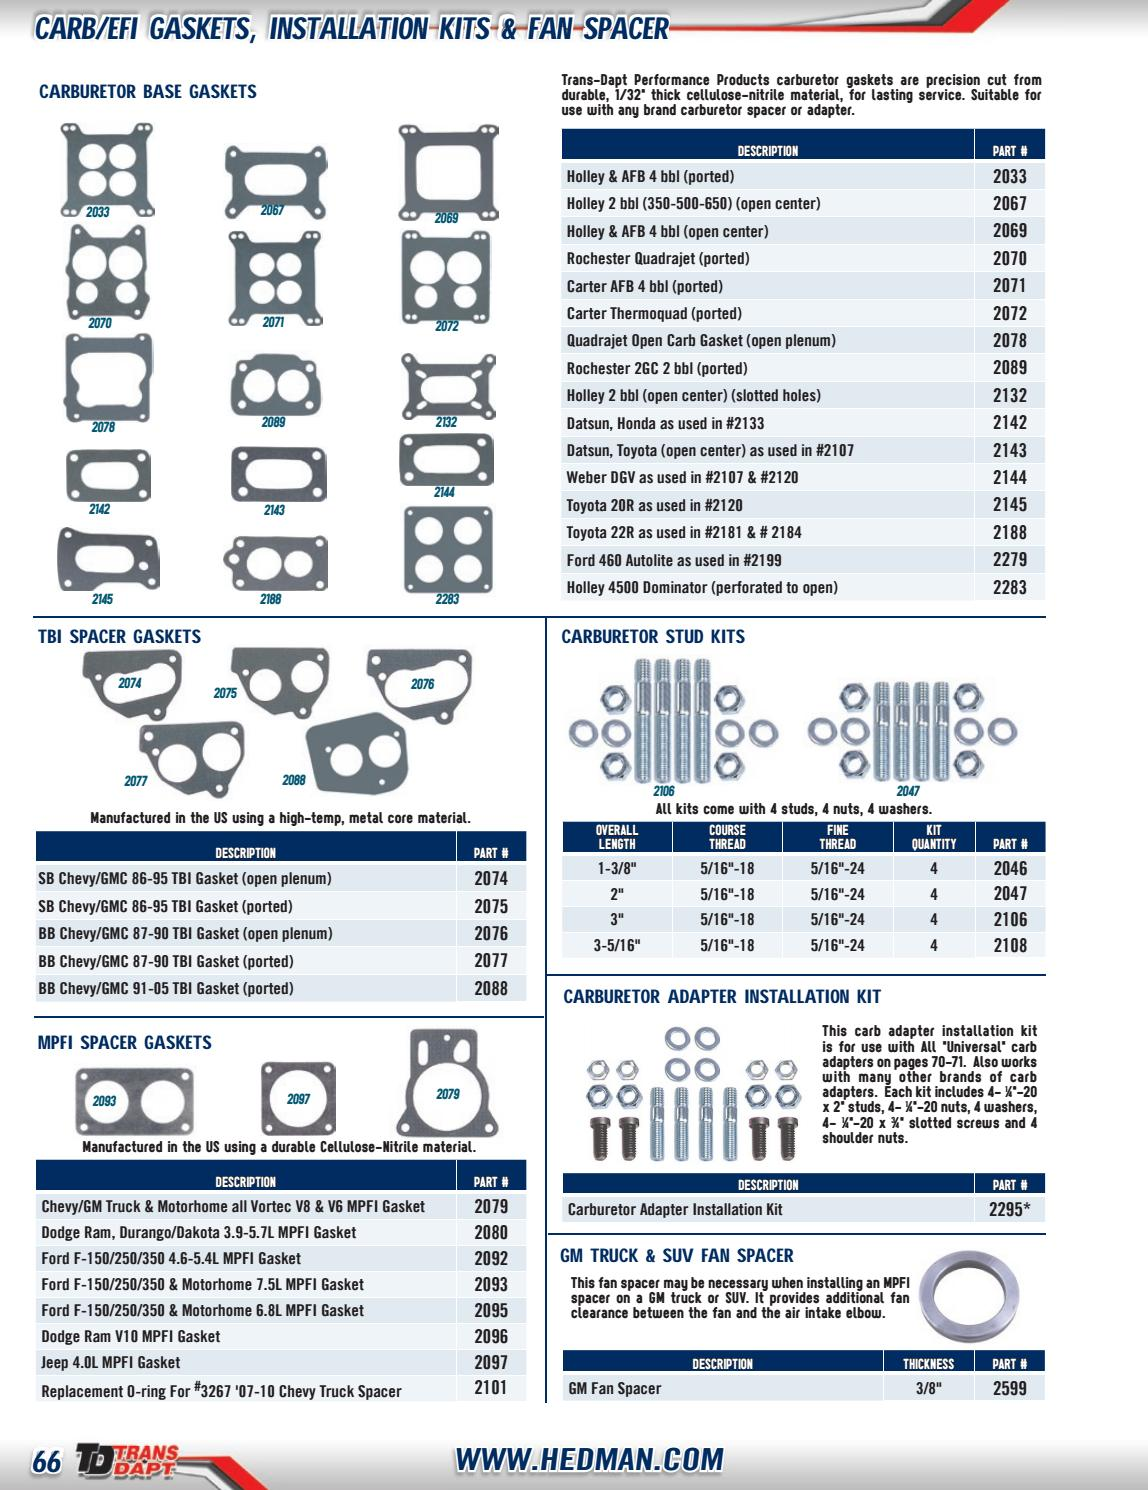 Trans-Dapt 2133 Carburetor Adapter